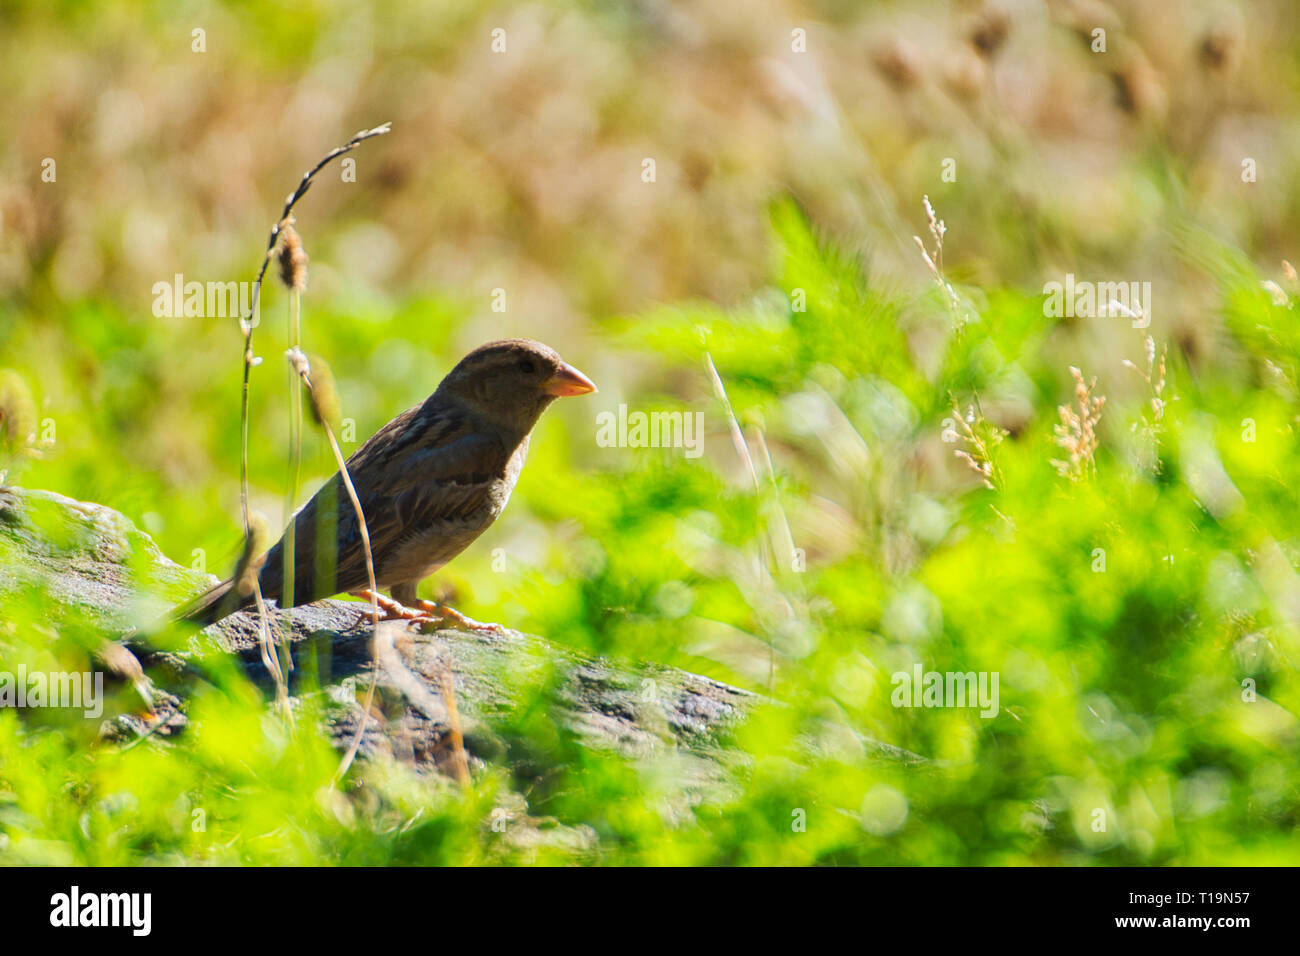 Perched Bird Stock Photo